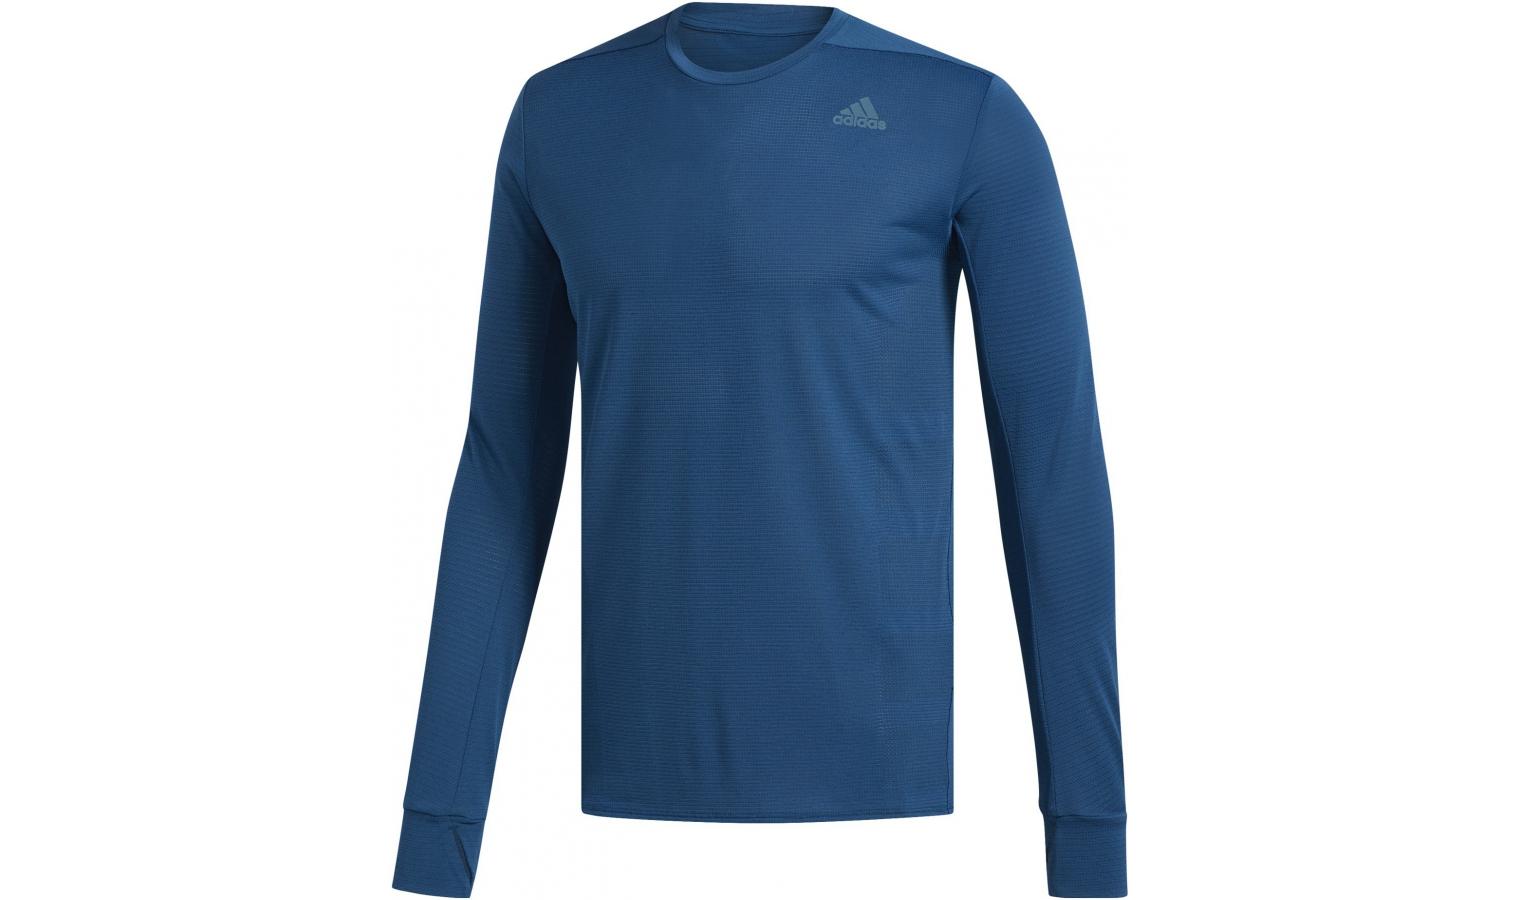 ba6733a83d Pánské funkční tričko adidas PRISM LS TEE modré